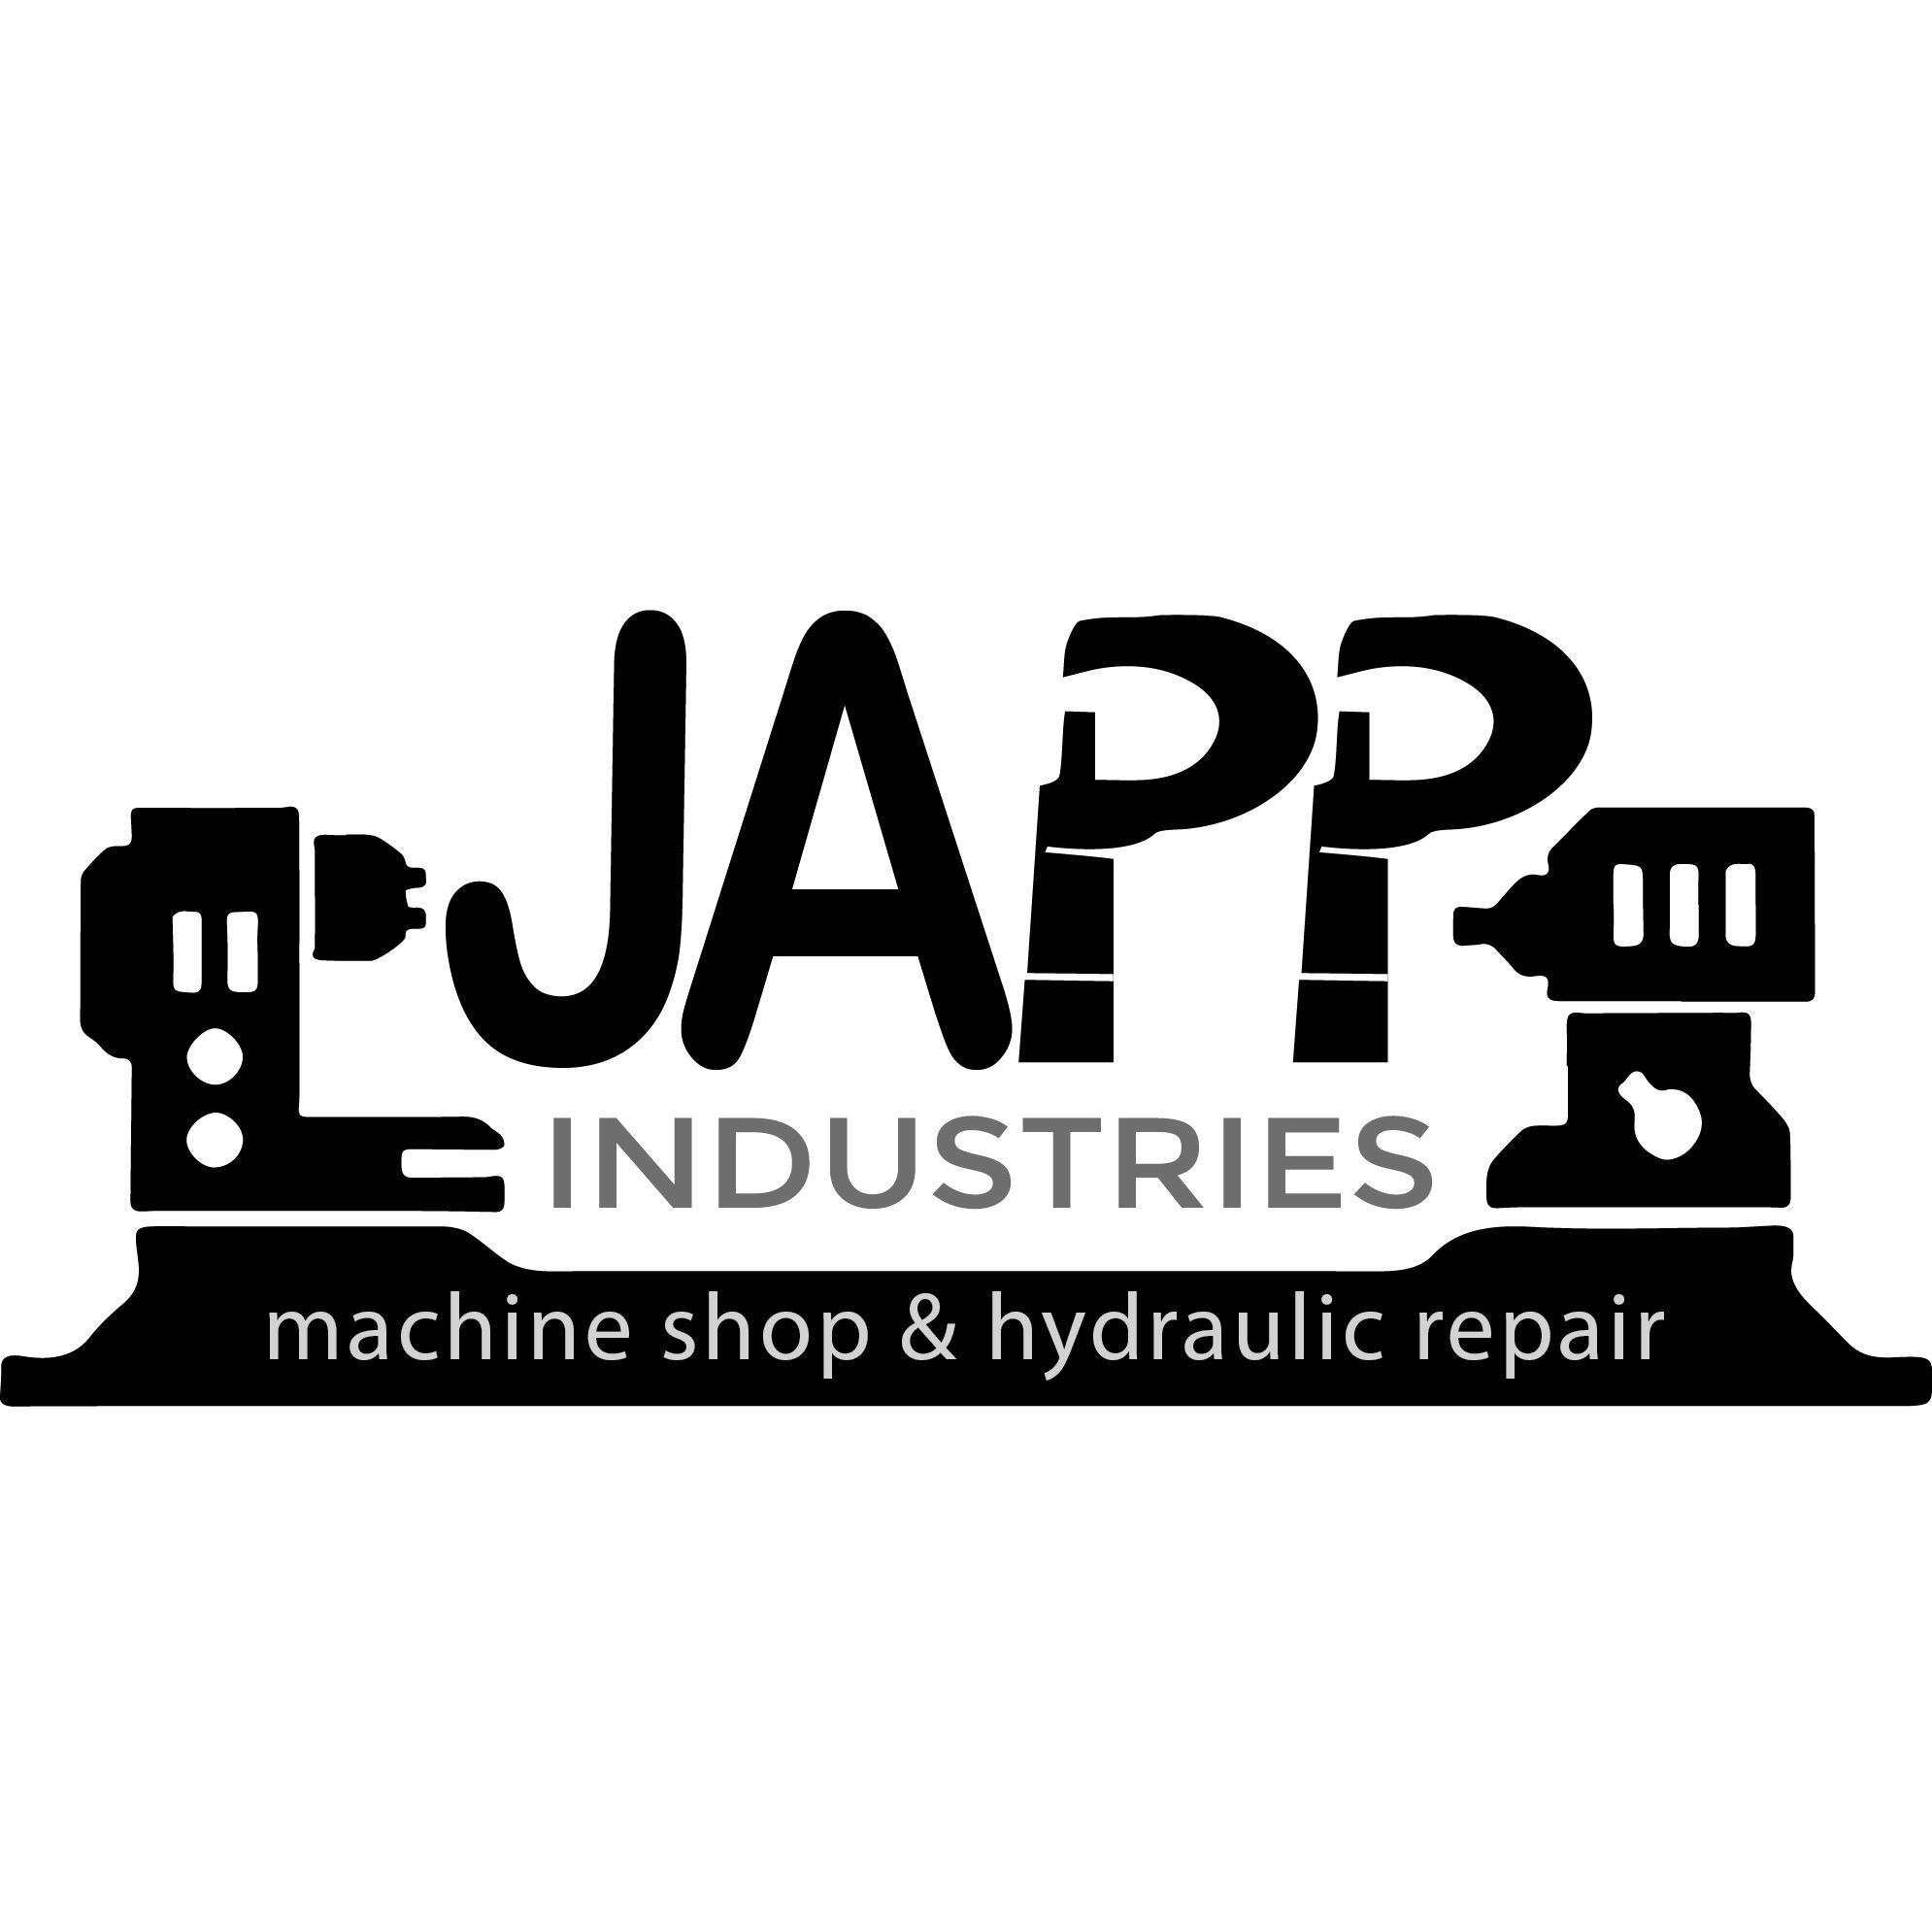 Japp Industries, Inc.